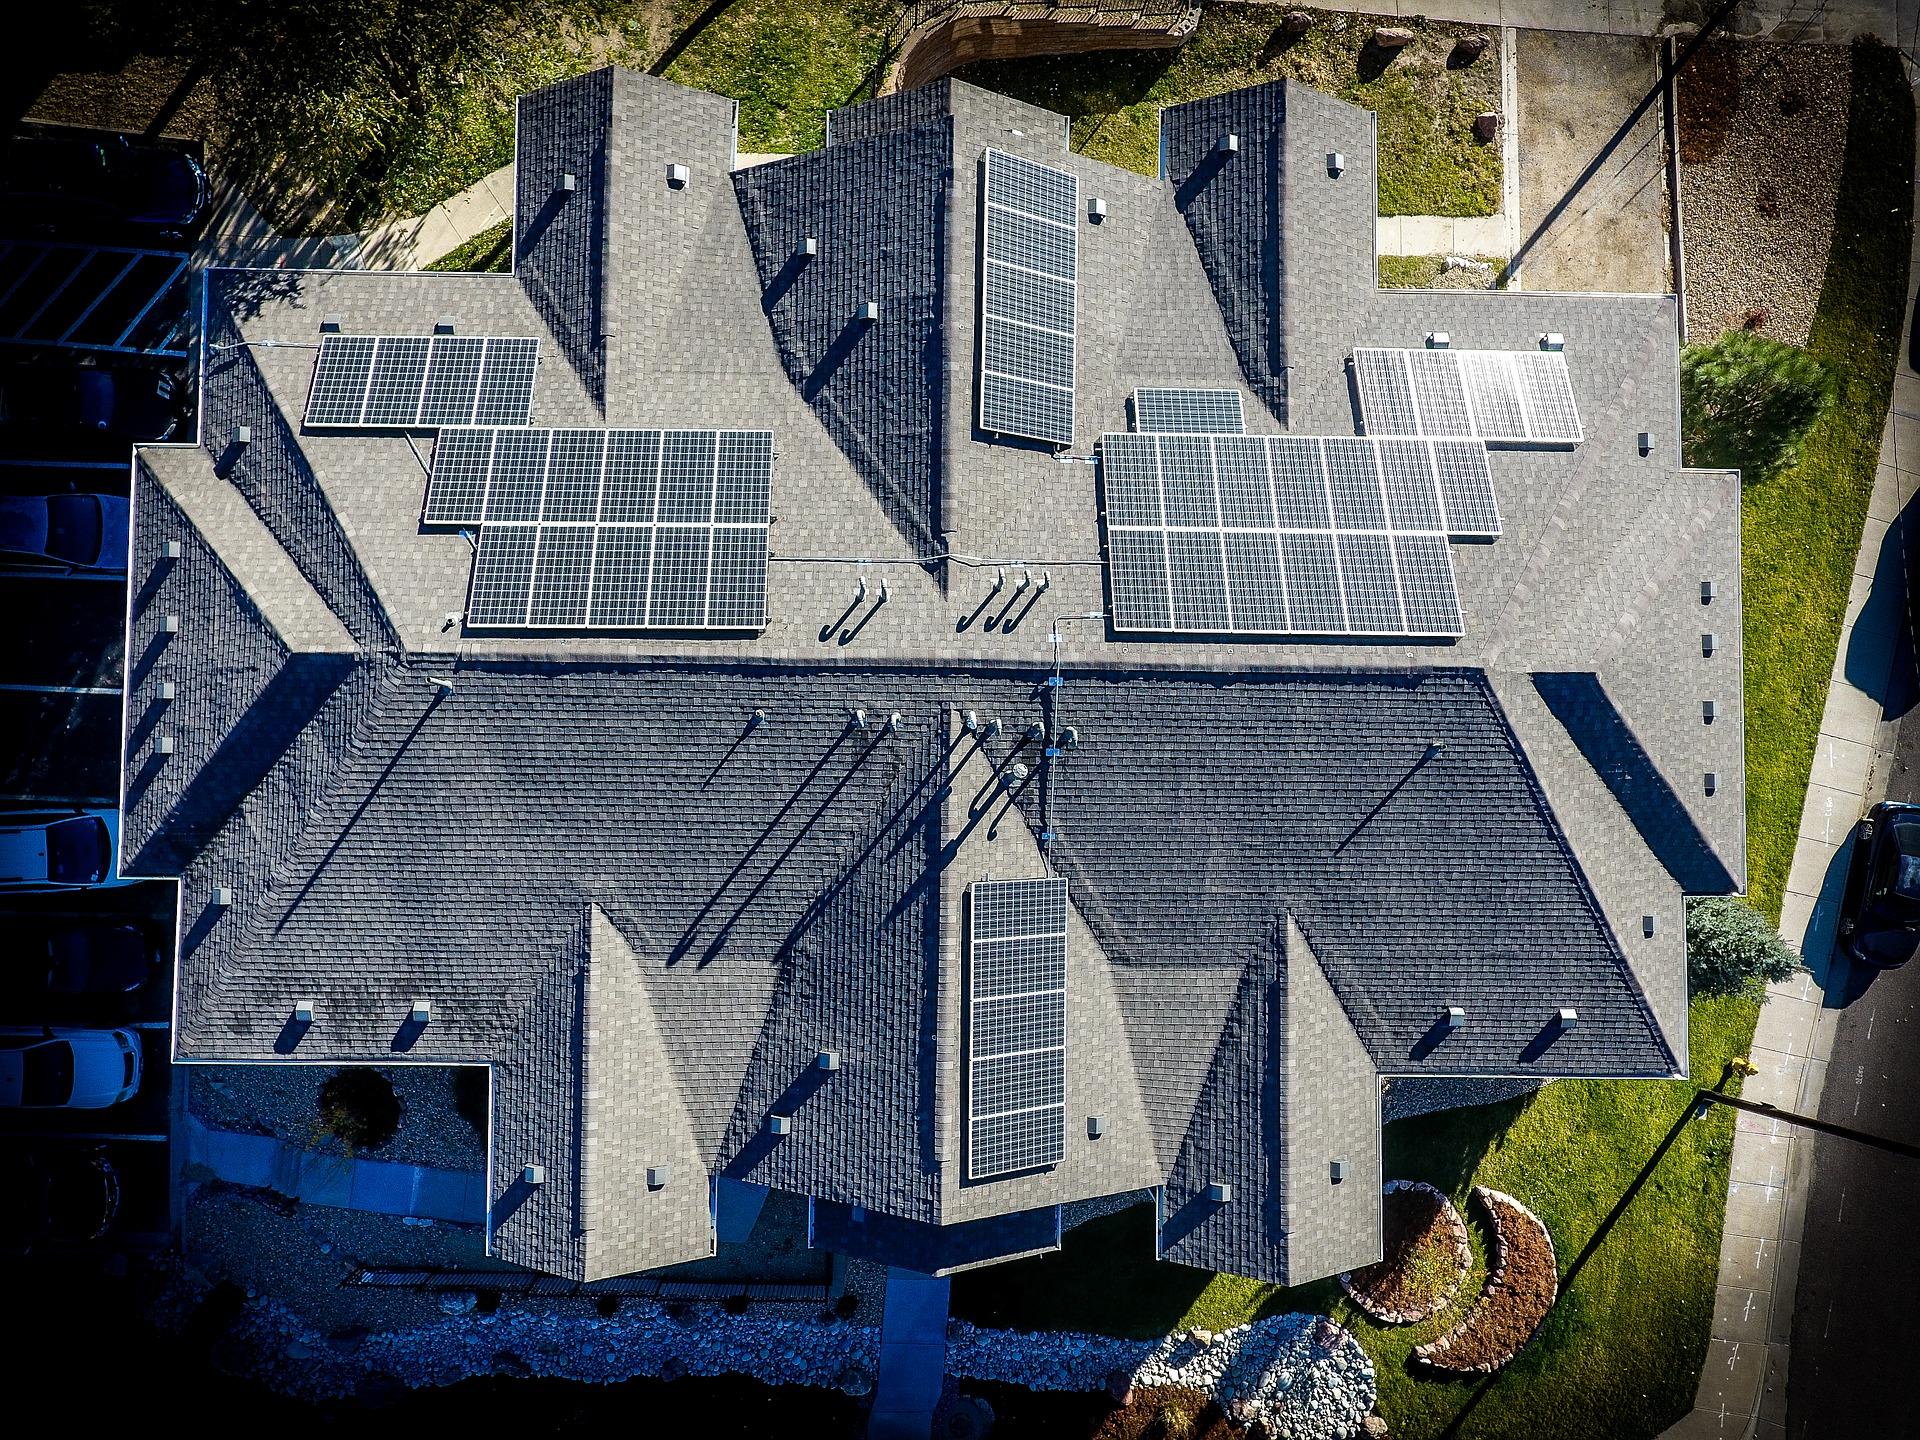 Nissan prodaje sonjačni paneli dlja domašnih elektrostancij